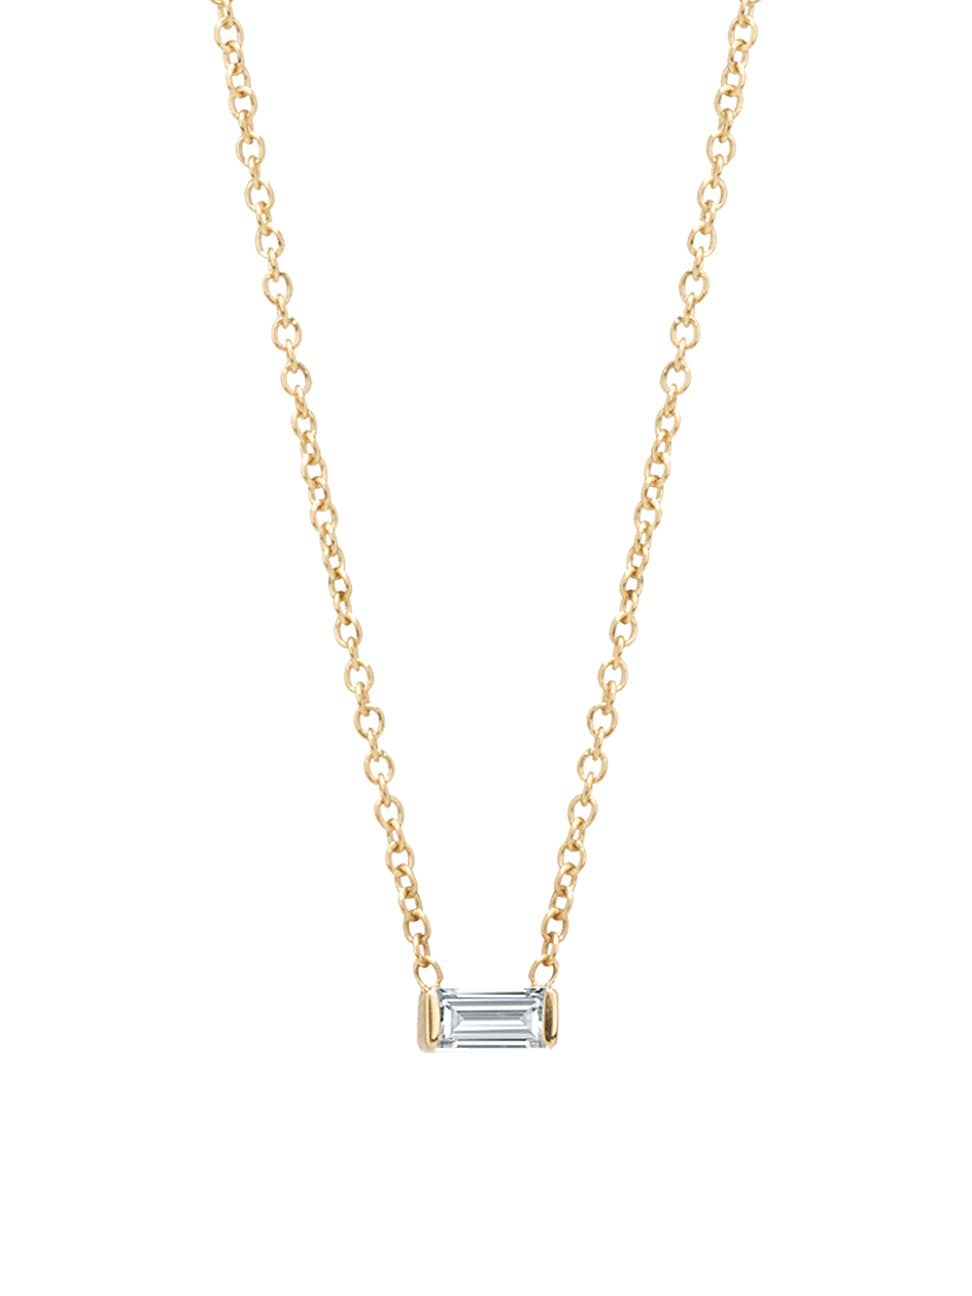 Zoë Chicco Women's Birthstones 14k Yellow Gold & White Diamond Horizontal Baguette Necklace